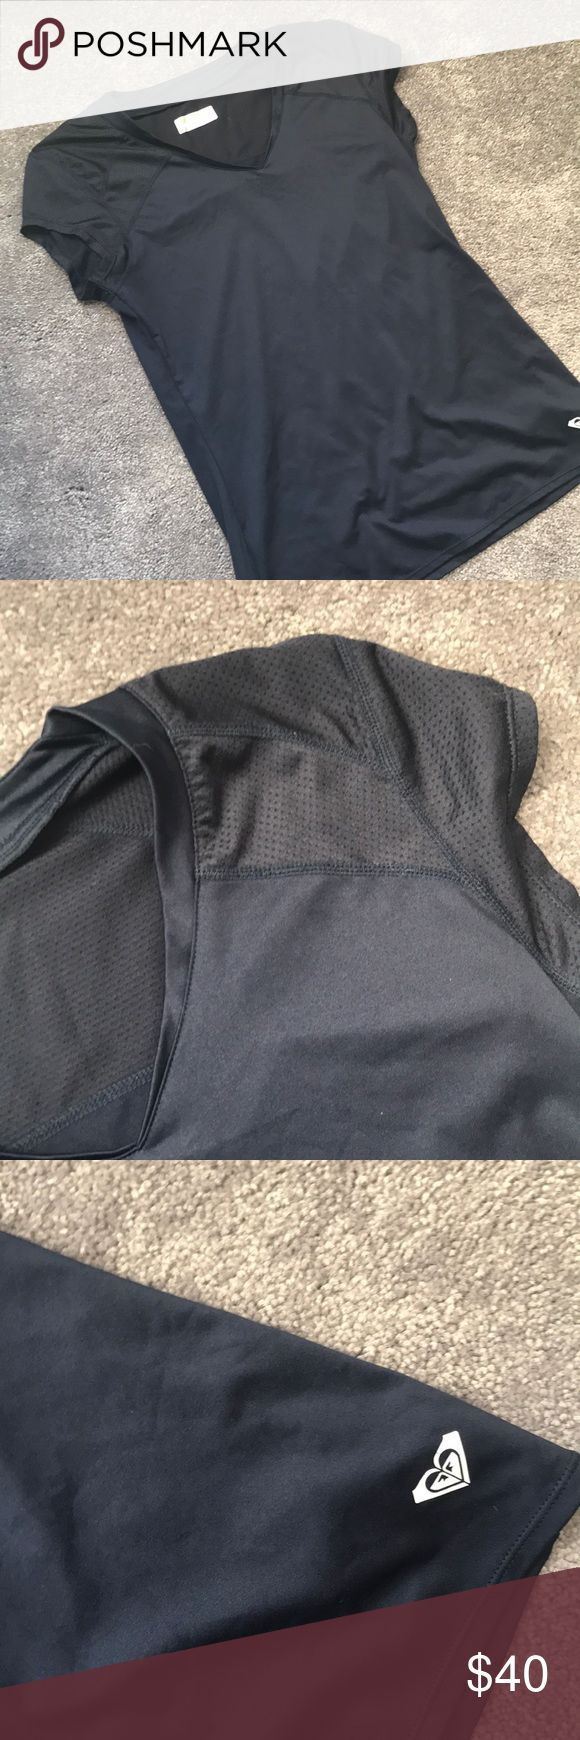 Roxy Athletic Shirt Navy blue athletic shirt. 90% poly, 10% spandex. Roxy Tops Tees - Short Sleeve